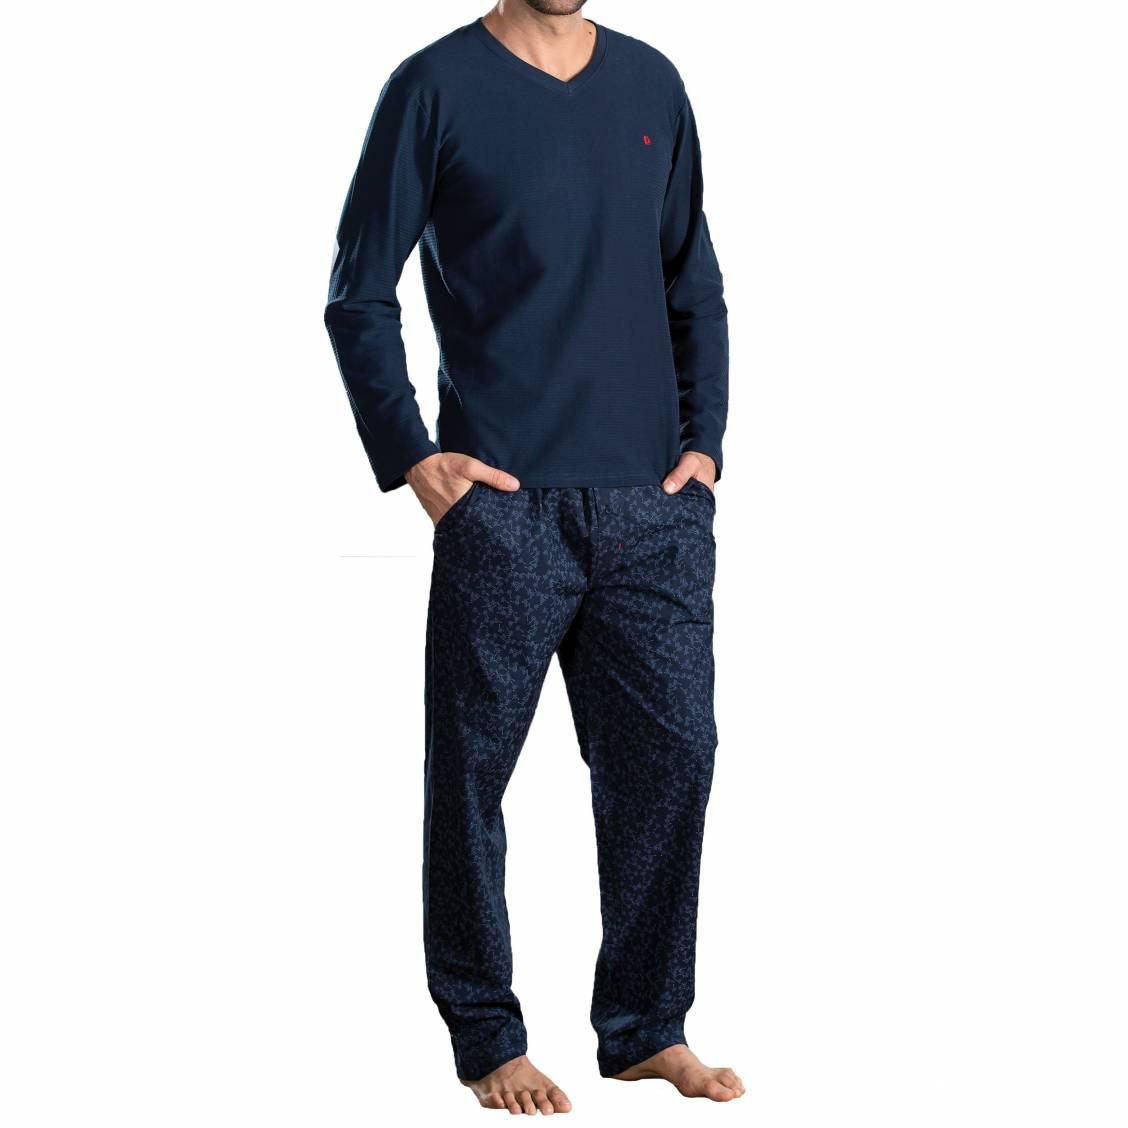 Pyjama long Dodo Roman en coton : tee-shirt manches longues col V en jersey bleu marine, pantalon en popeline bleu marine à fleurs bleu ciel